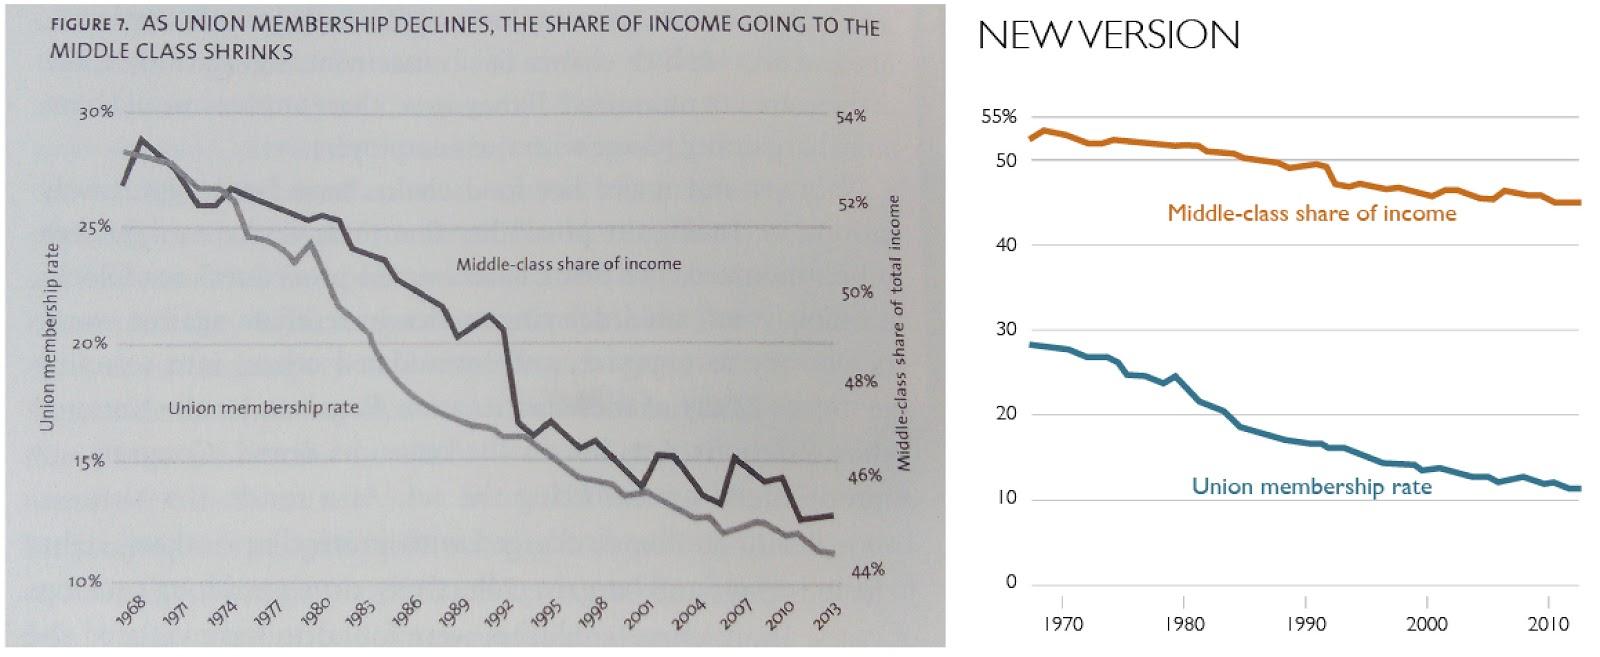 Alberto Cairo's reinterpretation of Dr. Reich's graph. Taken from Alberto Cairo's blog